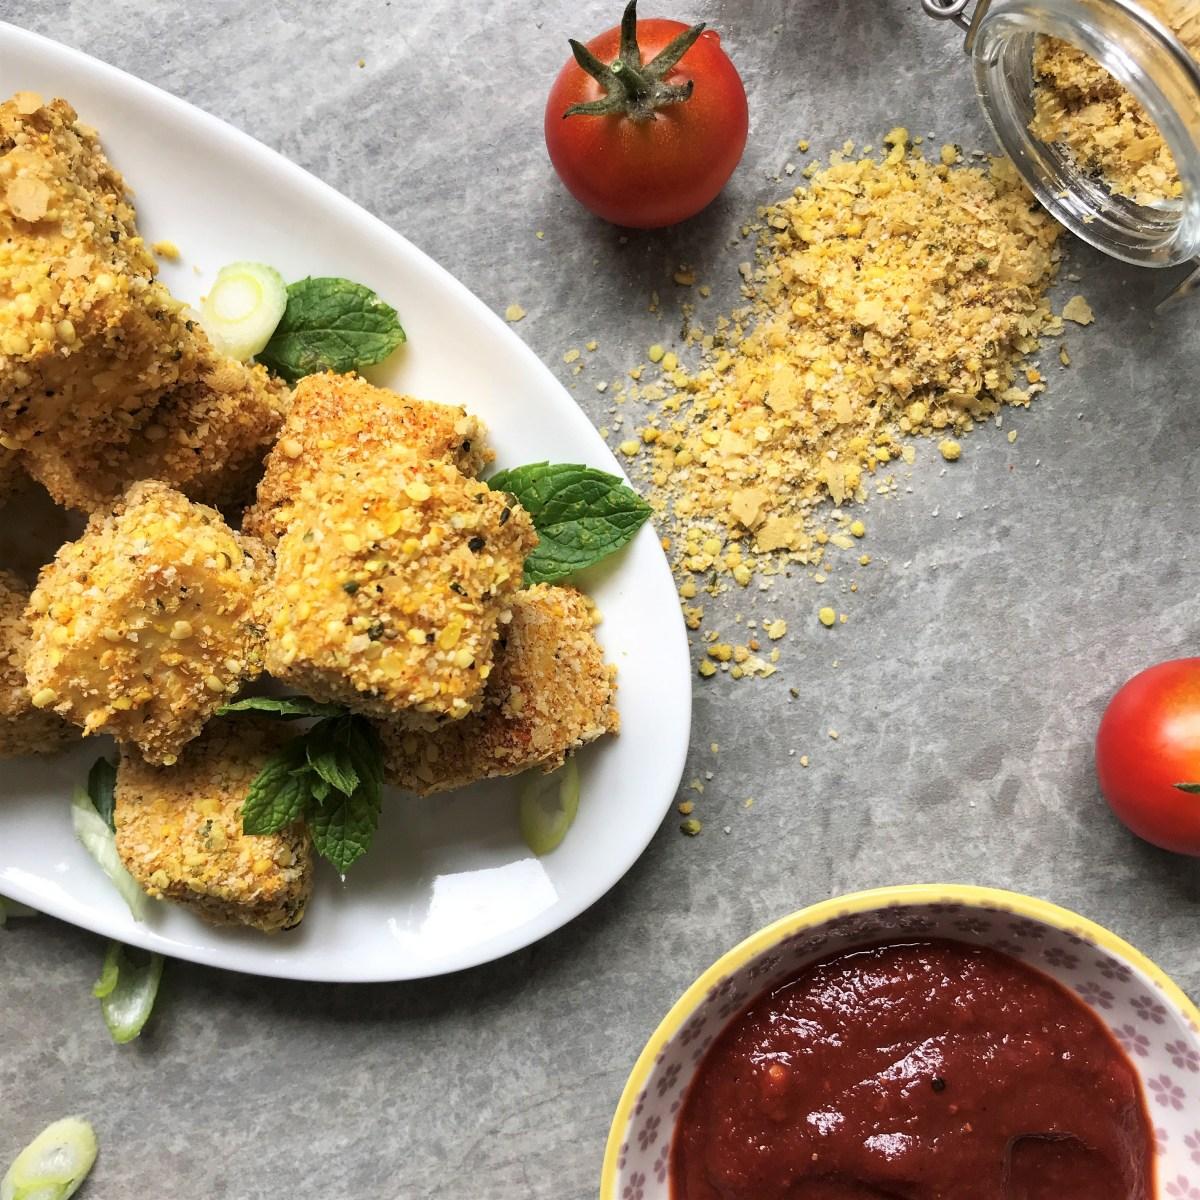 Vegan Tofu Nuggets with Spicy Tomato Sauce